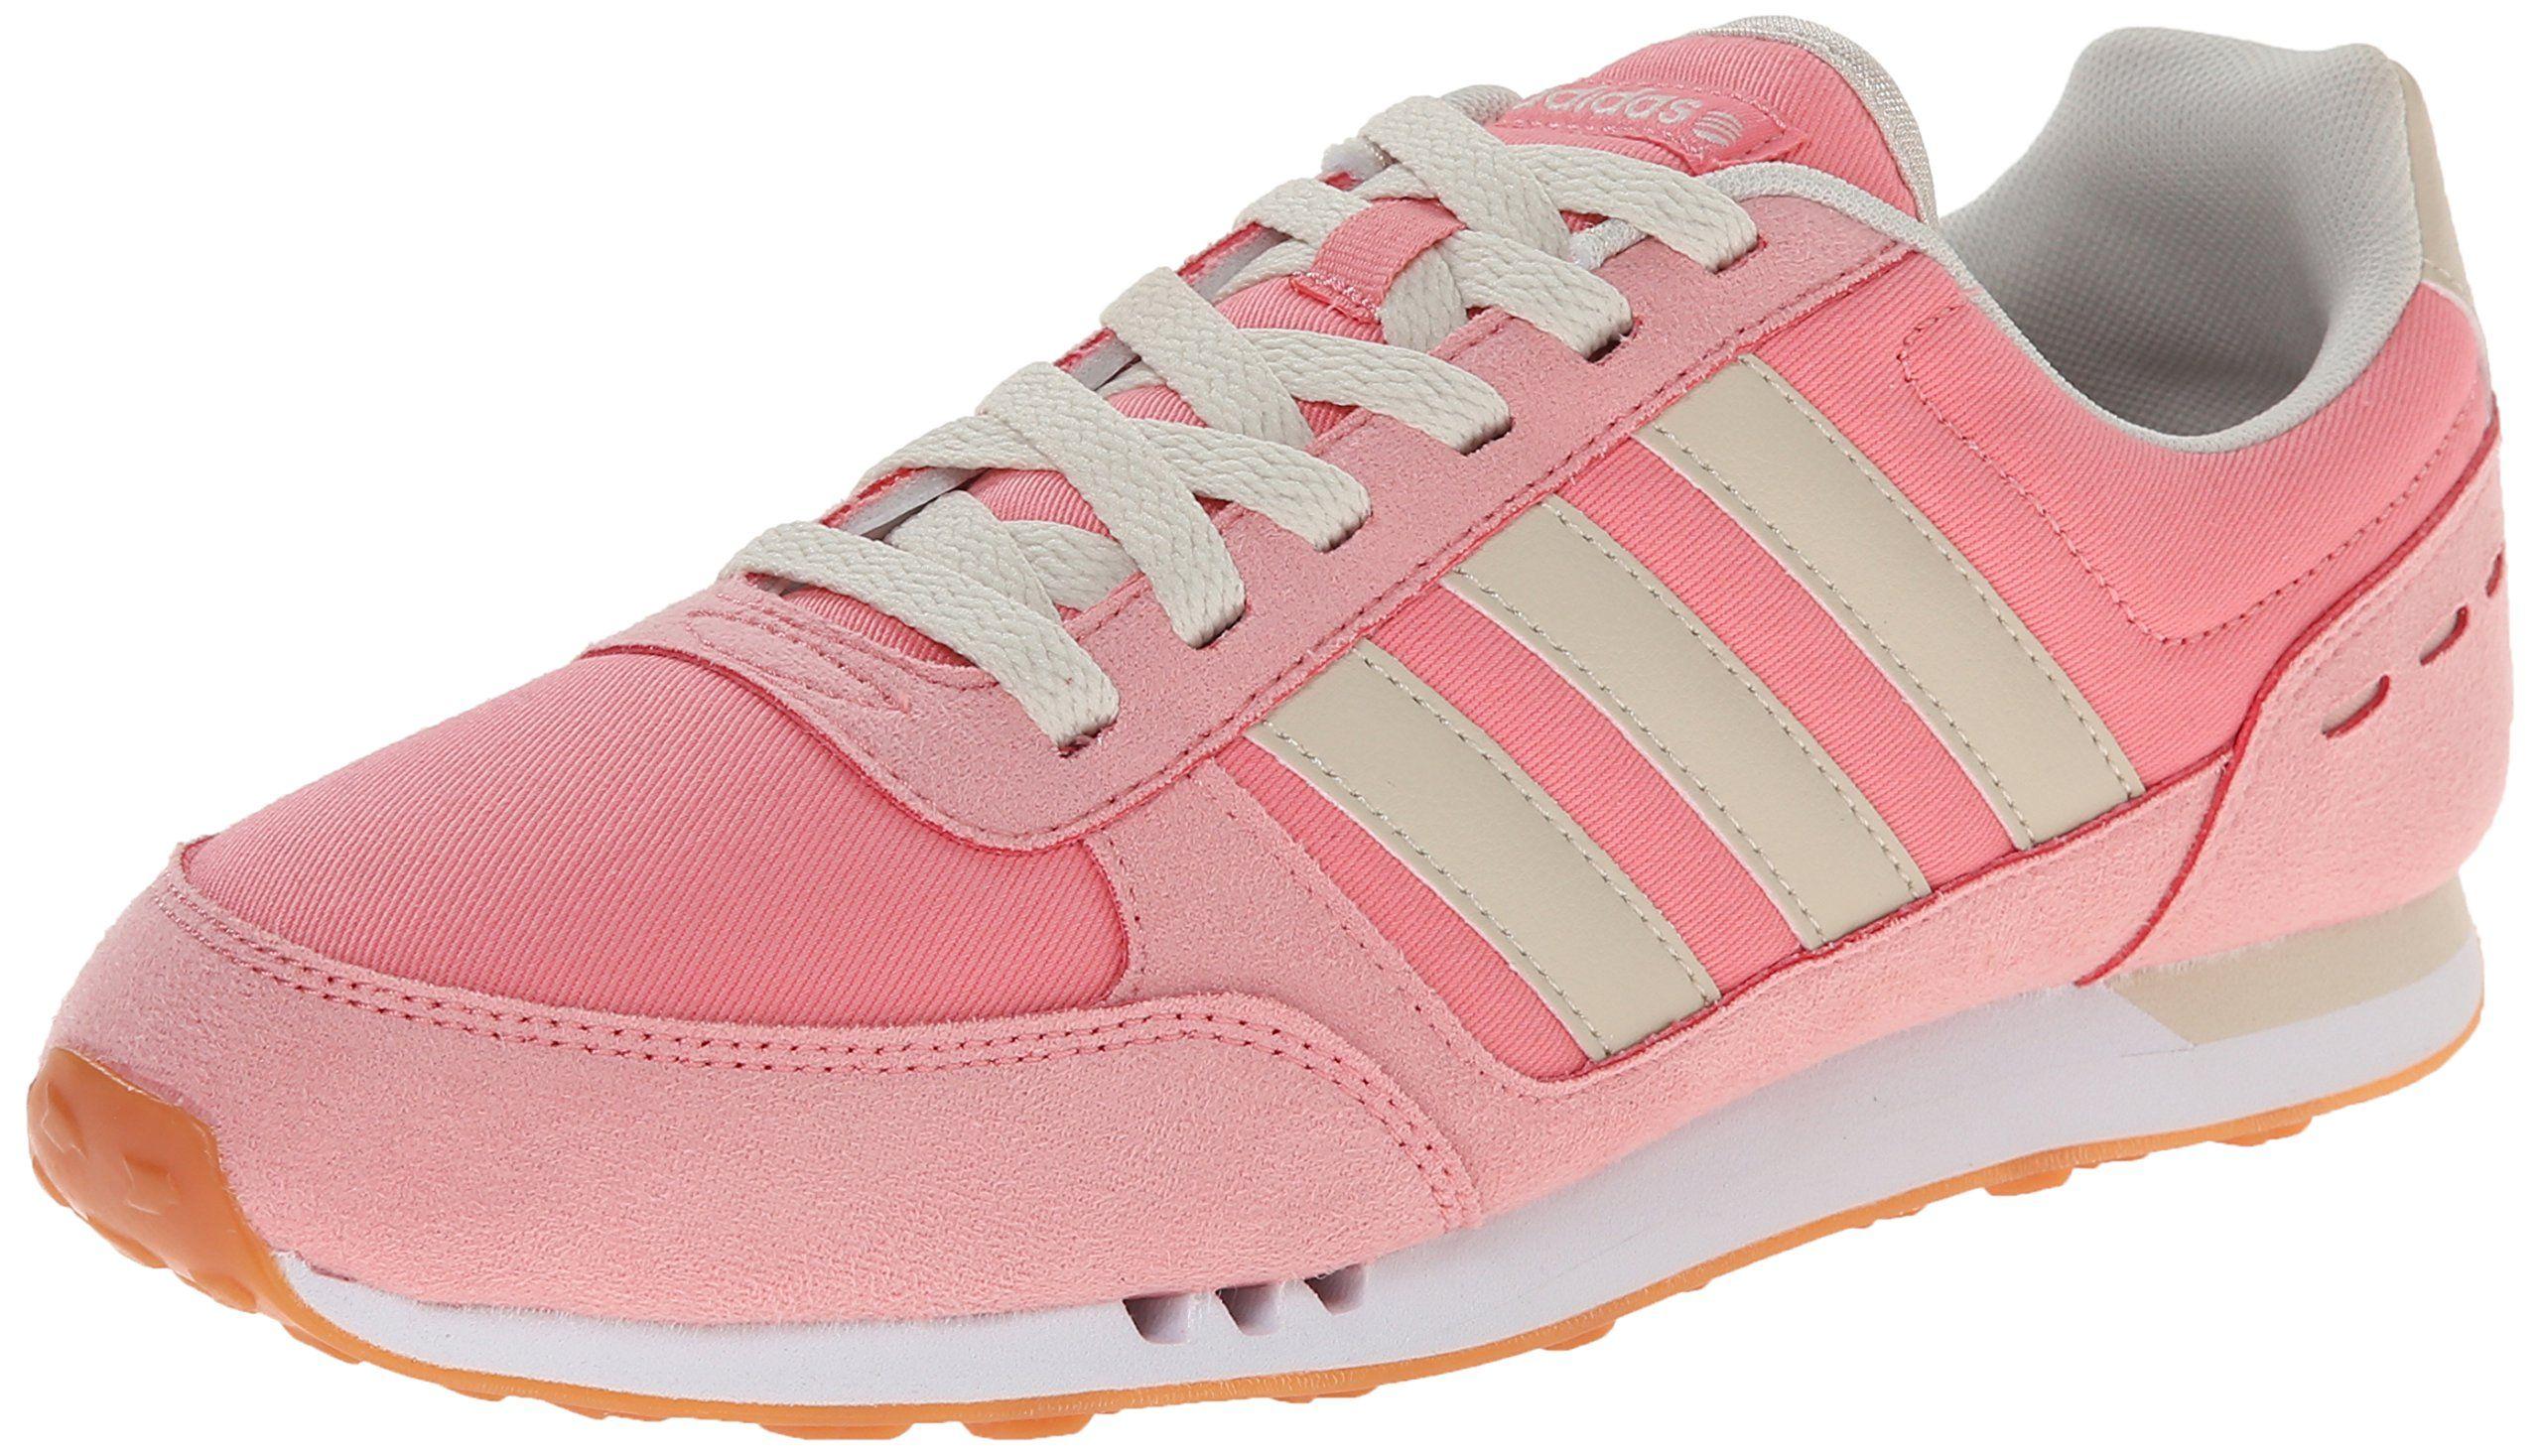 43f3bc65e7bcf Amazon.com: adidas NEO Women's City Racer Sneaker: Shoes | Adidas ...